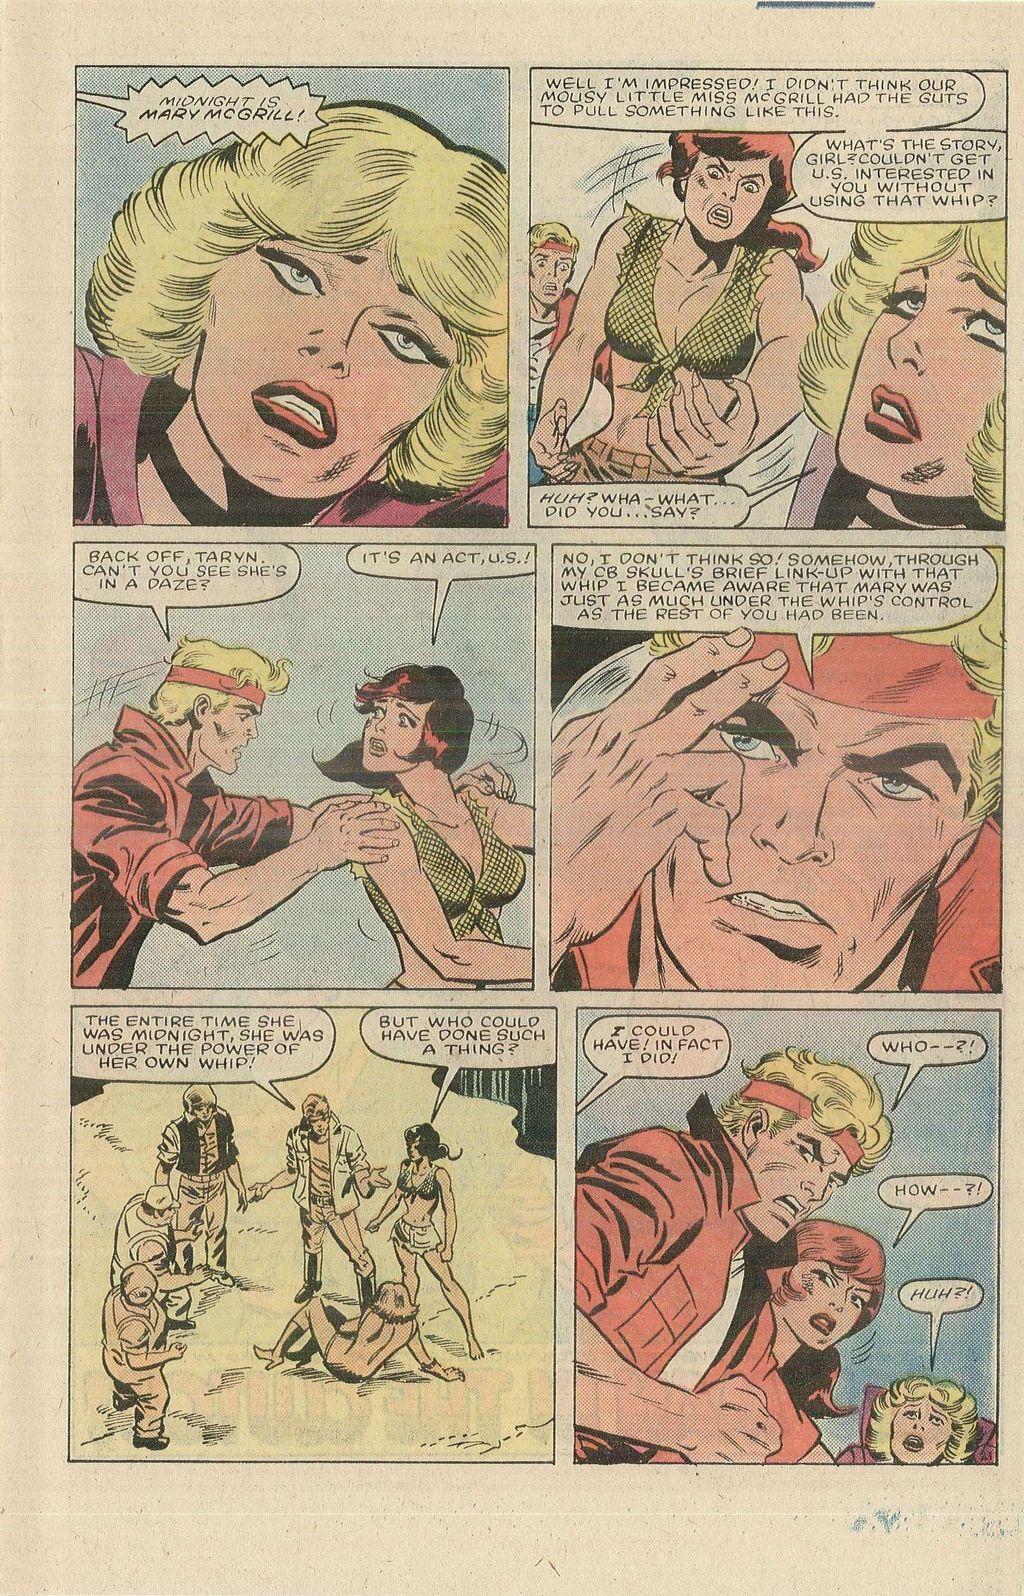 Read online U.S. 1 comic -  Issue #9 - 31